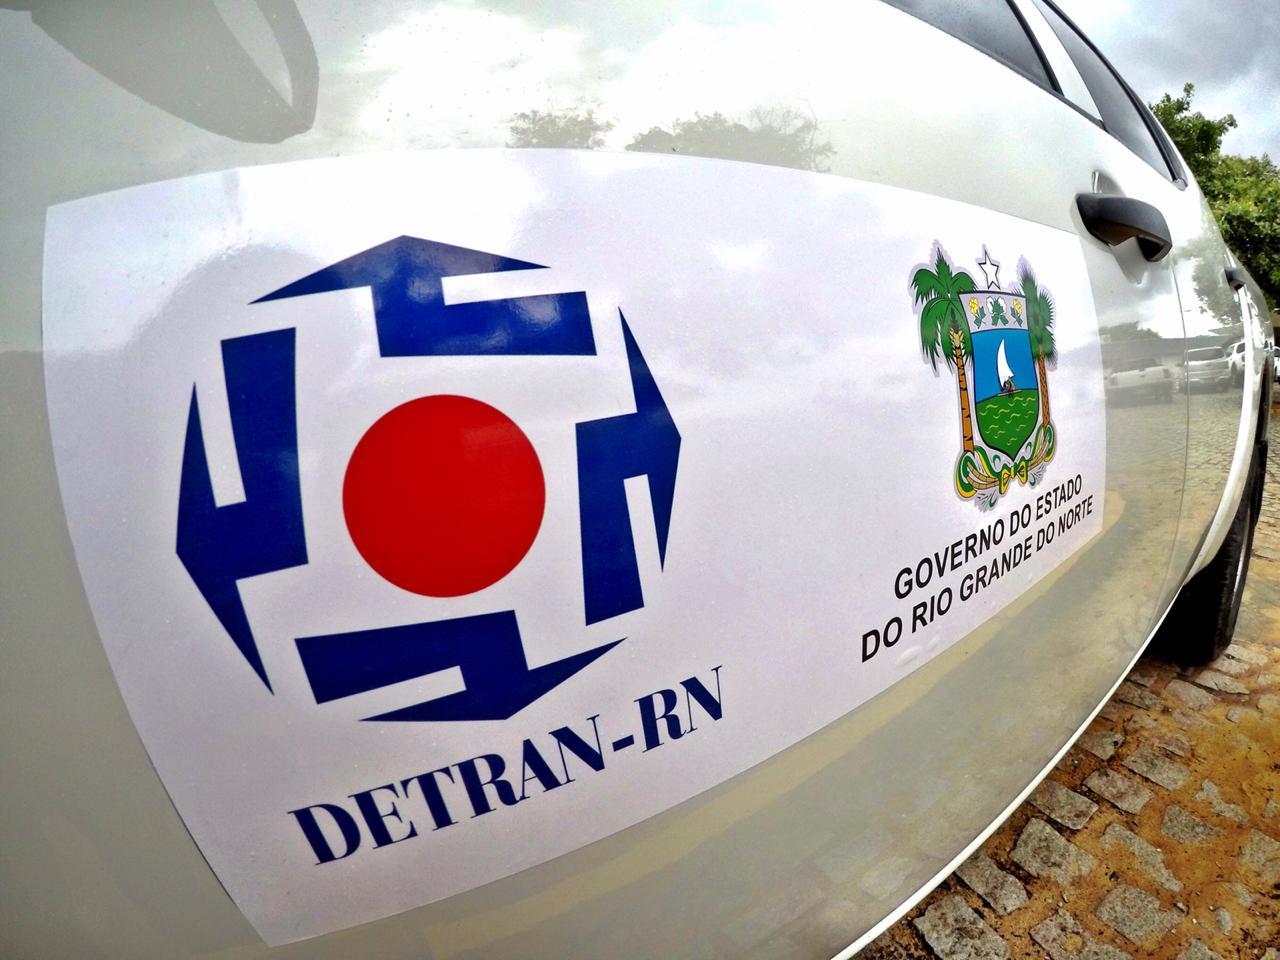 Detran-RN oferece pagamento parcelado do IPVA